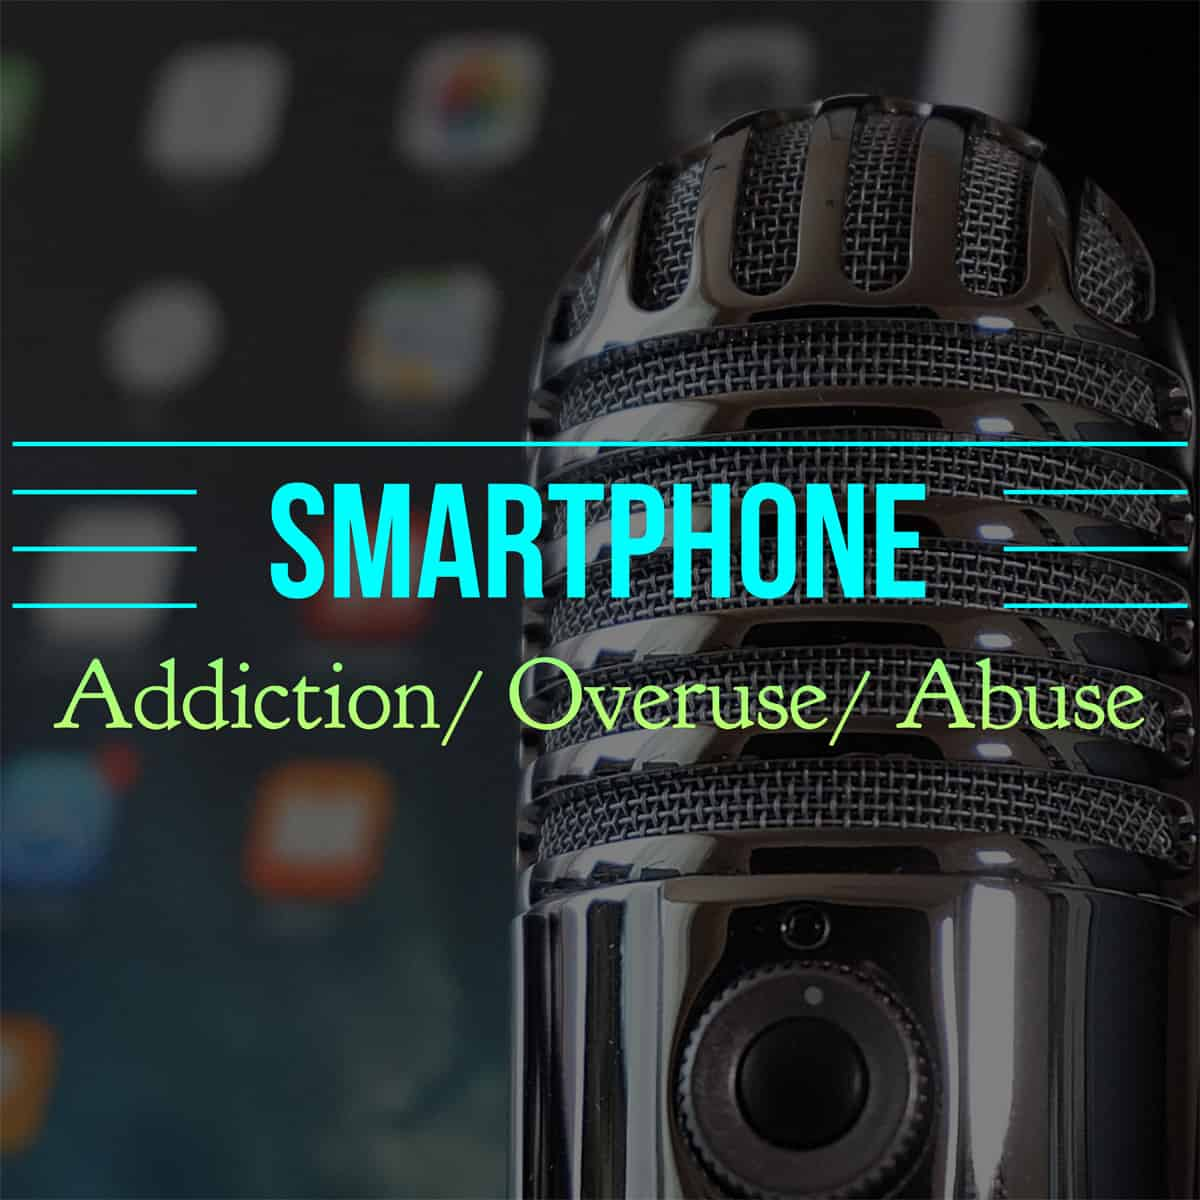 Ep. 55: Smartphone Addiction, Overuse, and Abuse